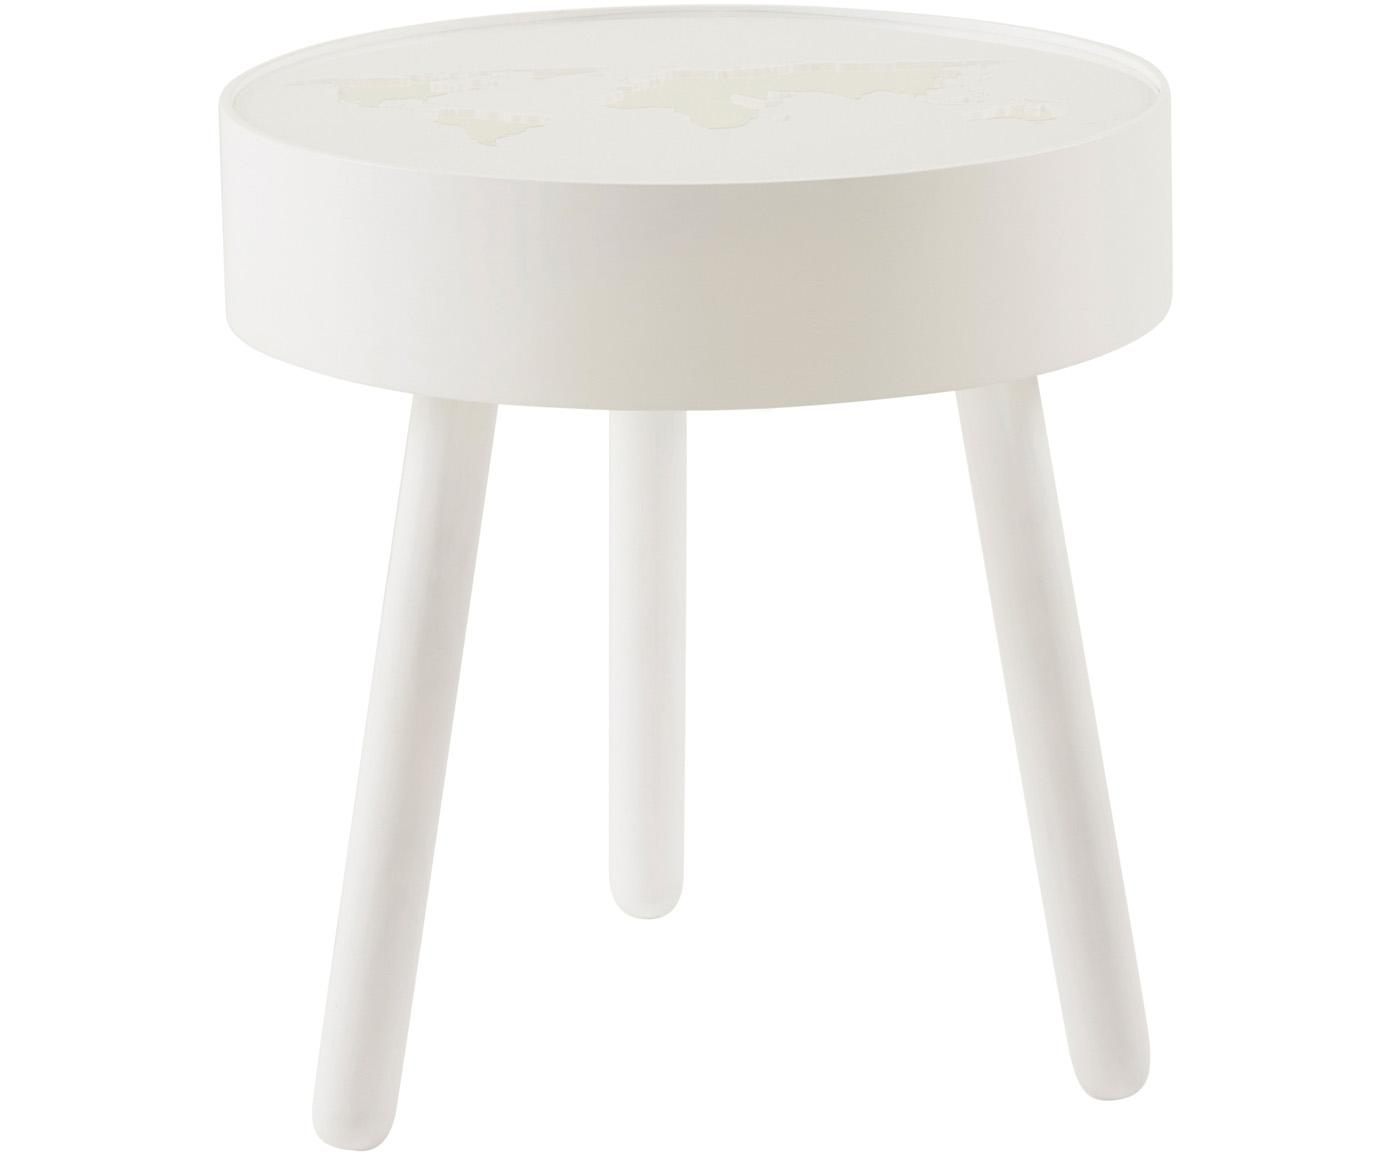 LED Stehlampe Monroy, Gestell: Holz, Tischplatte: Acrylglas, Weiß, Ø 40 x H 42 cm